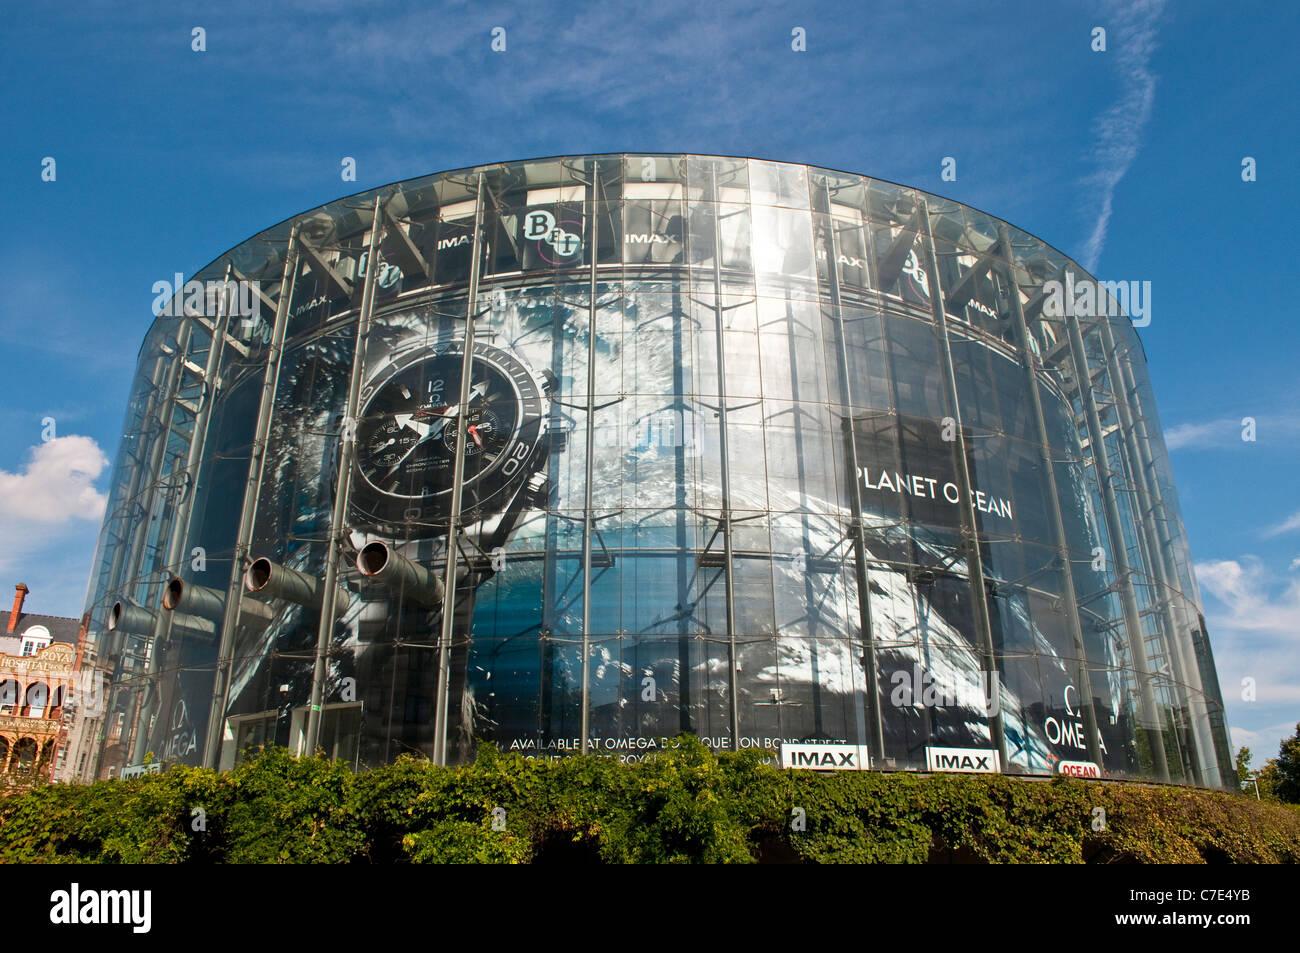 BFI IMAX cinema, London, England, United Kingdom - Stock Image